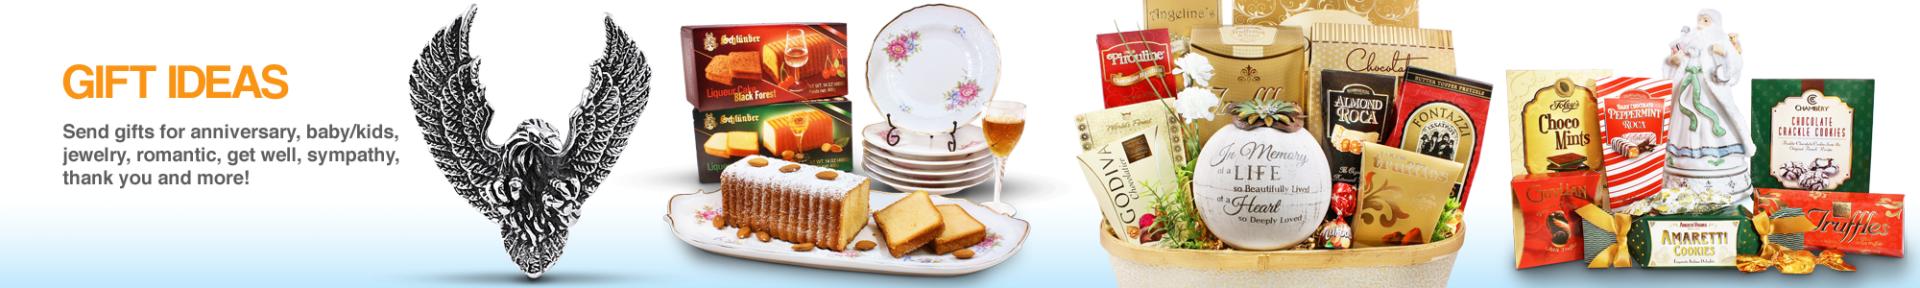 Gift Ideas - Gourmet Gift Basket Store